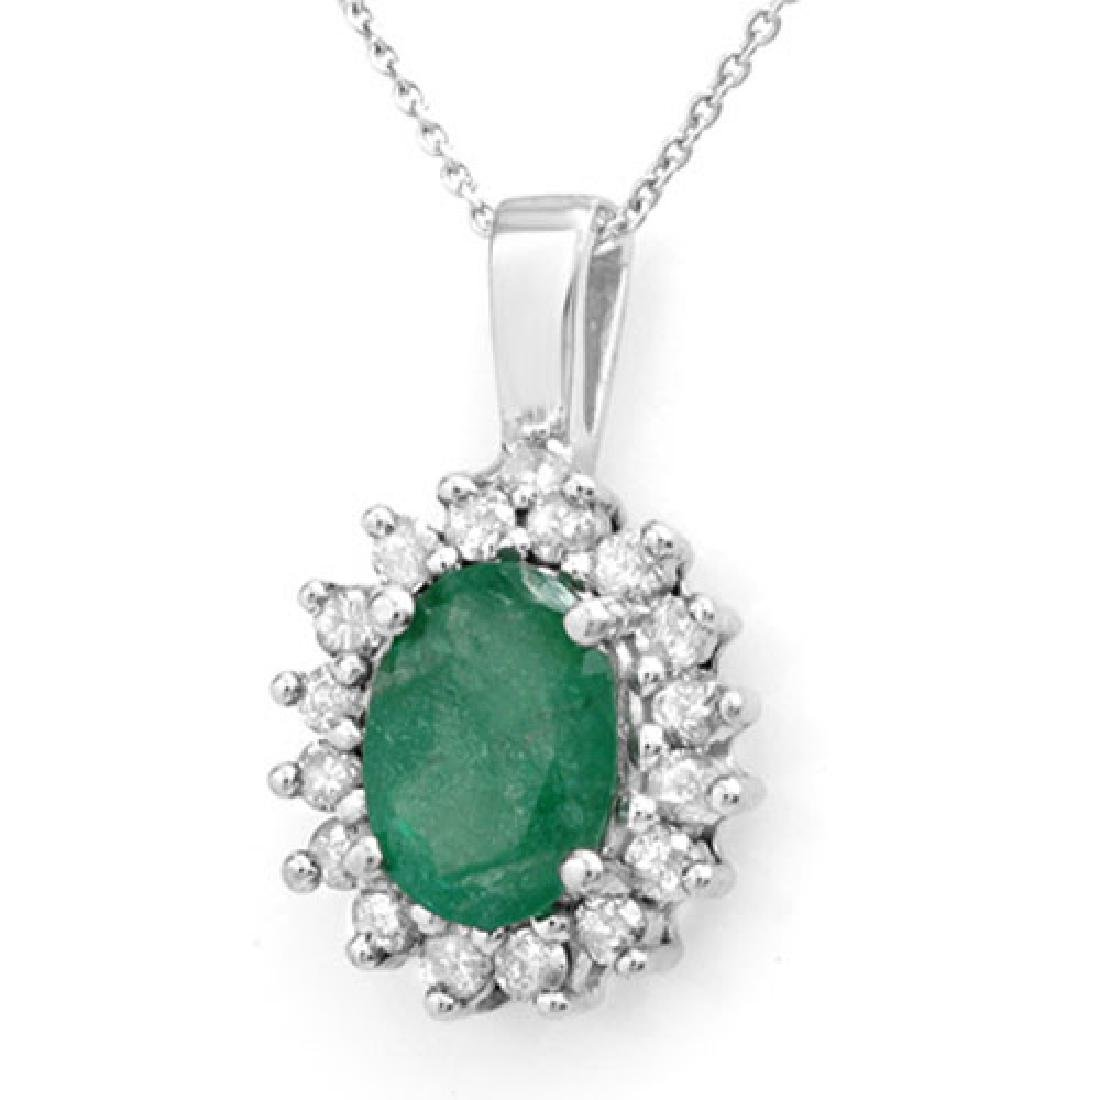 3.48 CTW Emerald & Diamond Pendant 14K White Gold